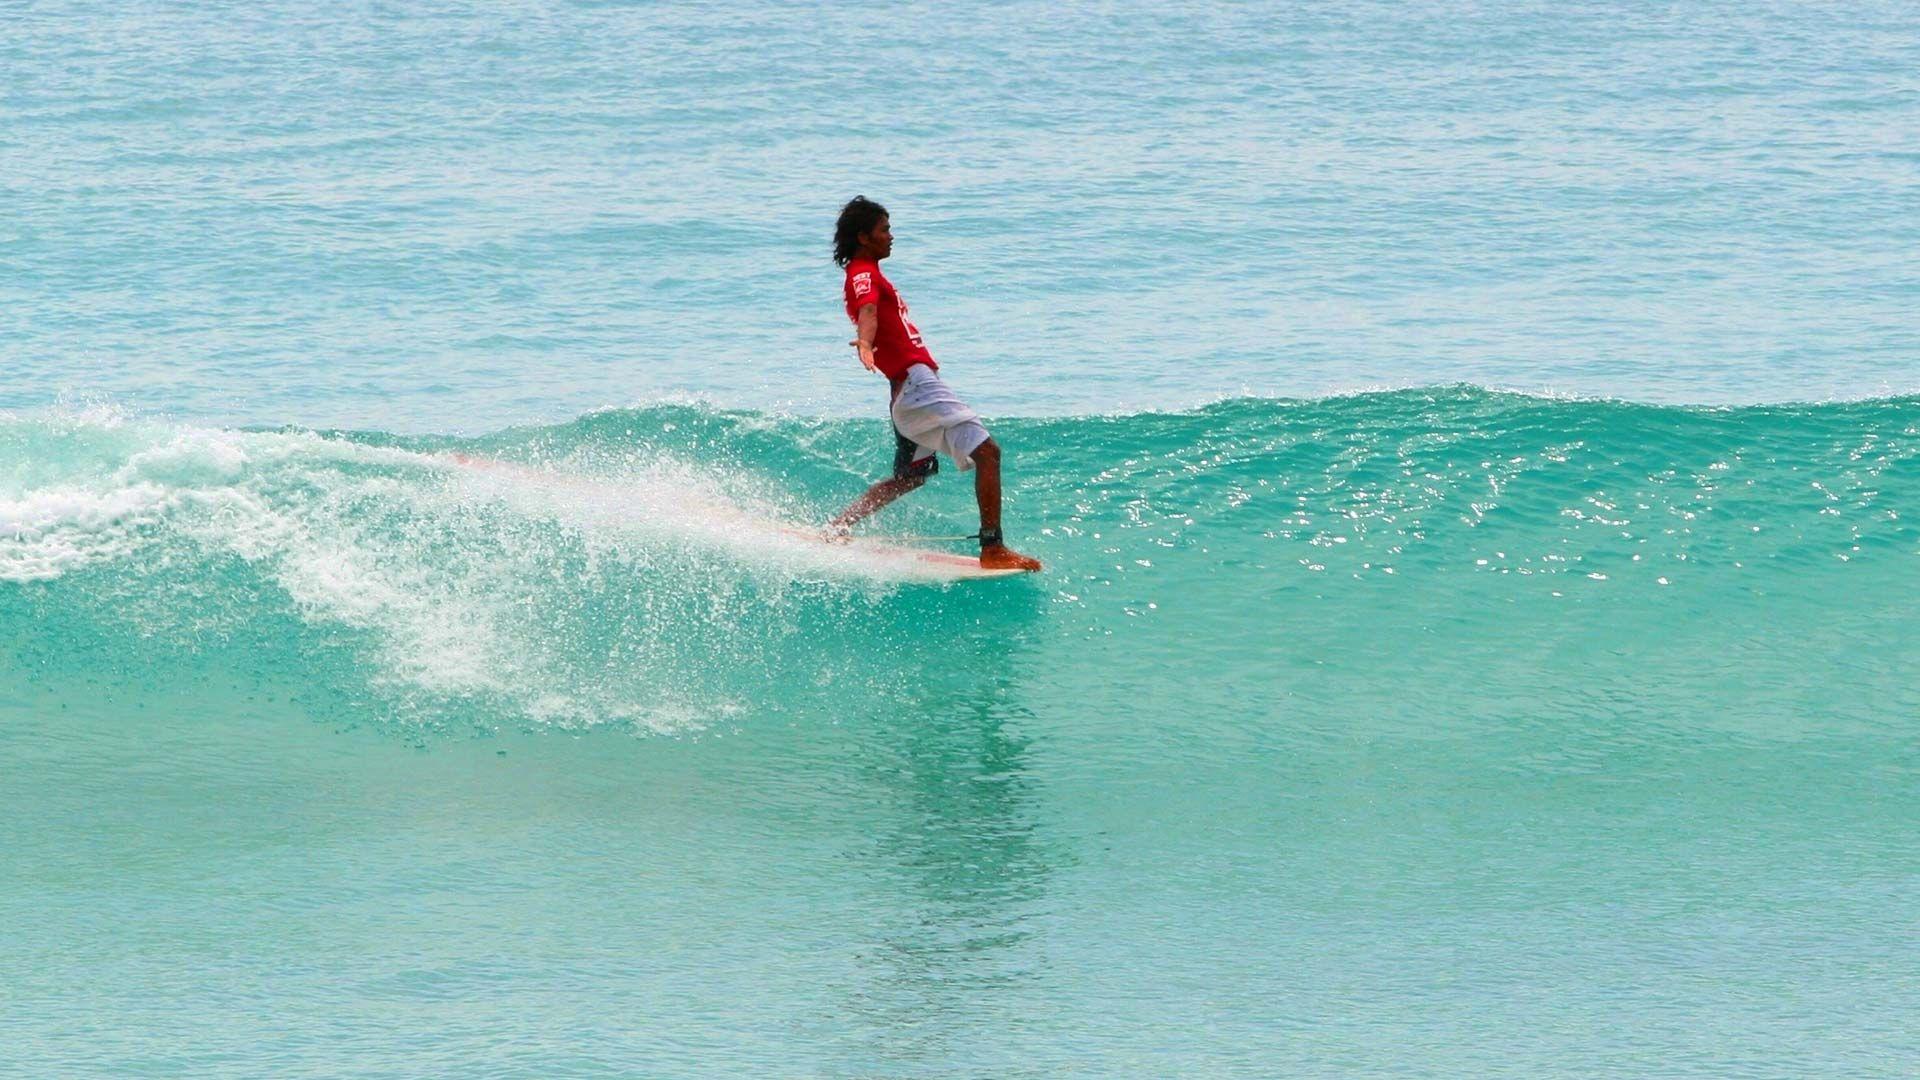 Surfing Phuket - Kata Beach - Education Abroad Asia   Phuket, Surfing, Surfing destinations